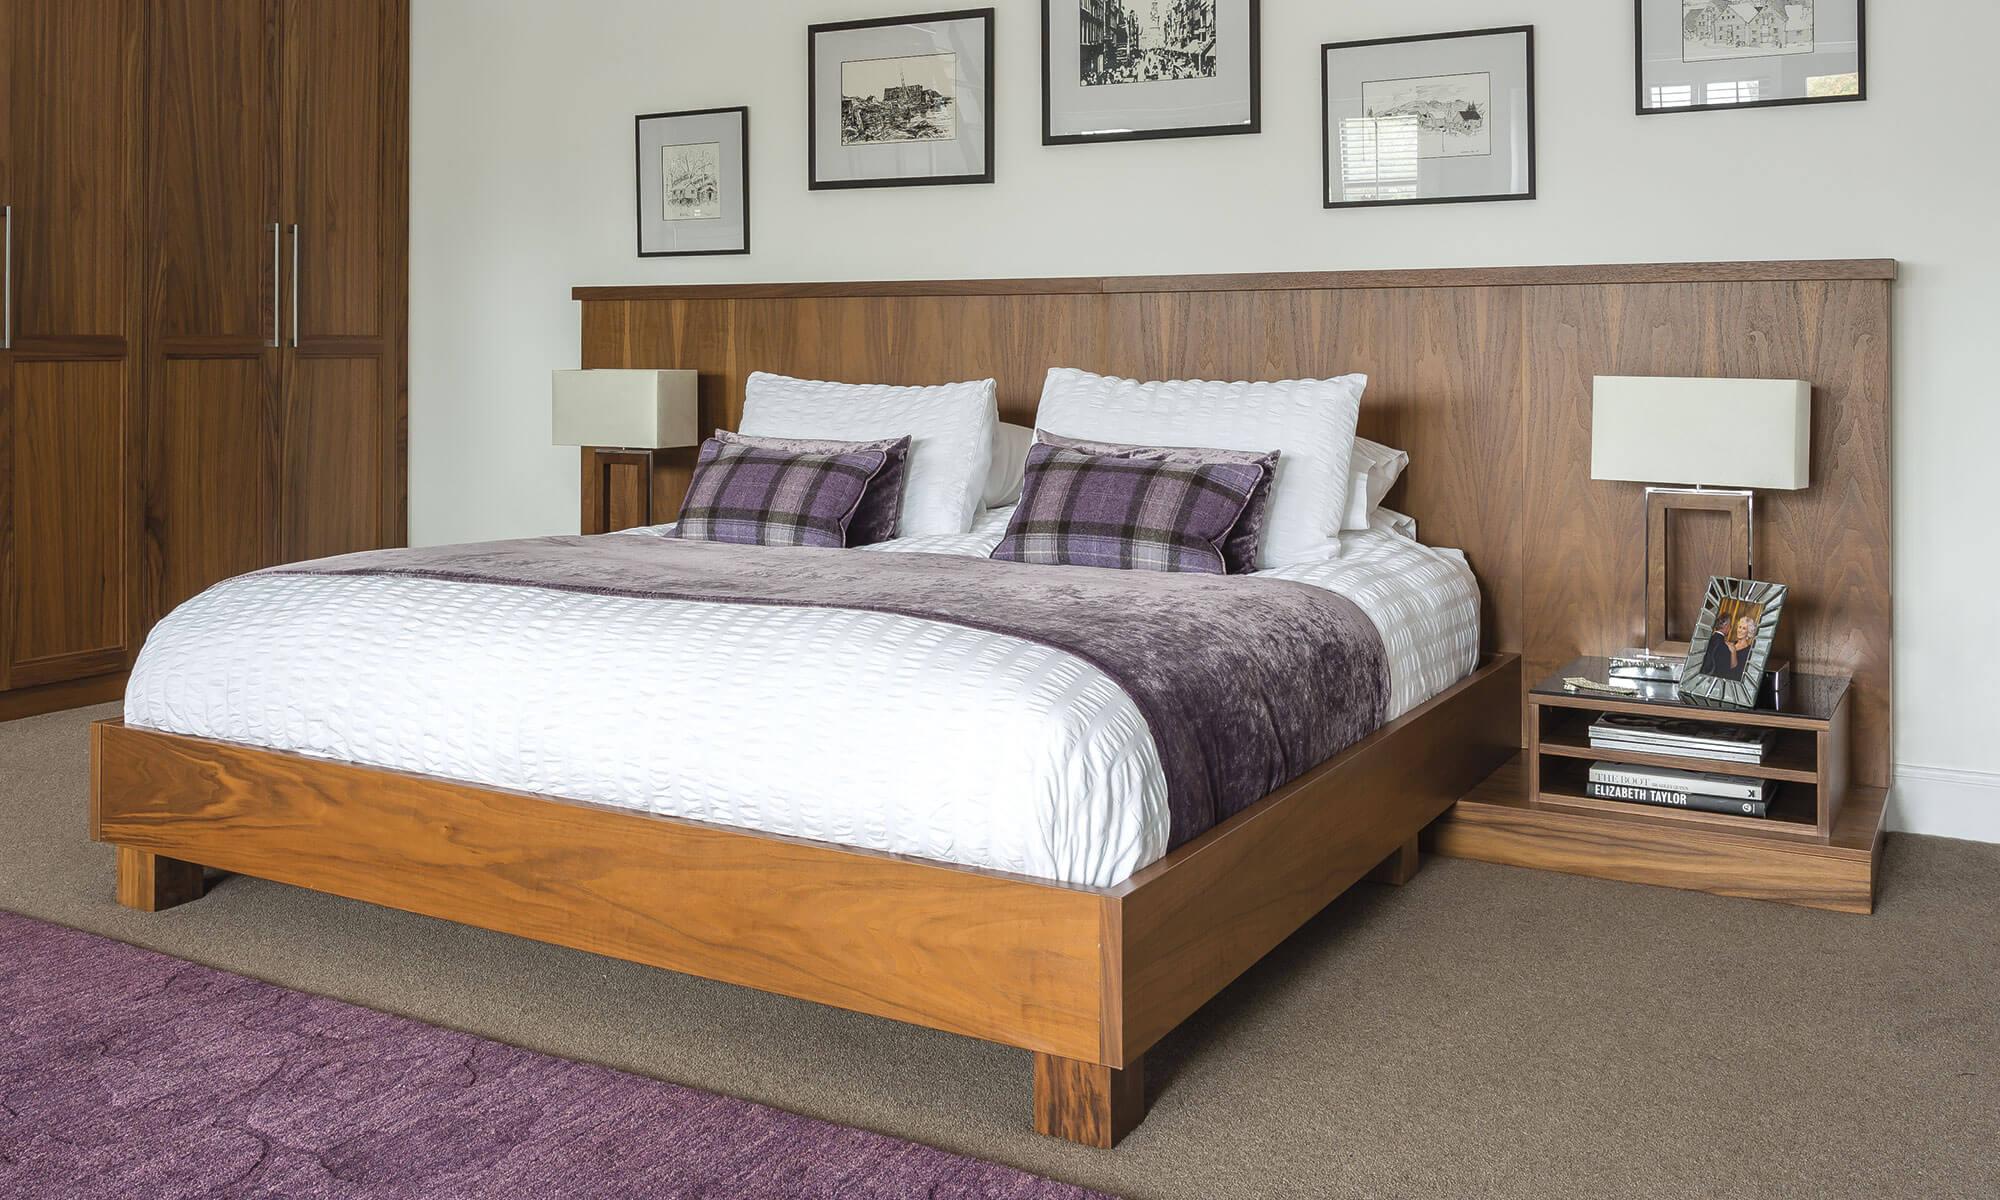 glamorous bedroom furniture uk home design. Black Bedroom Furniture Sets. Home Design Ideas